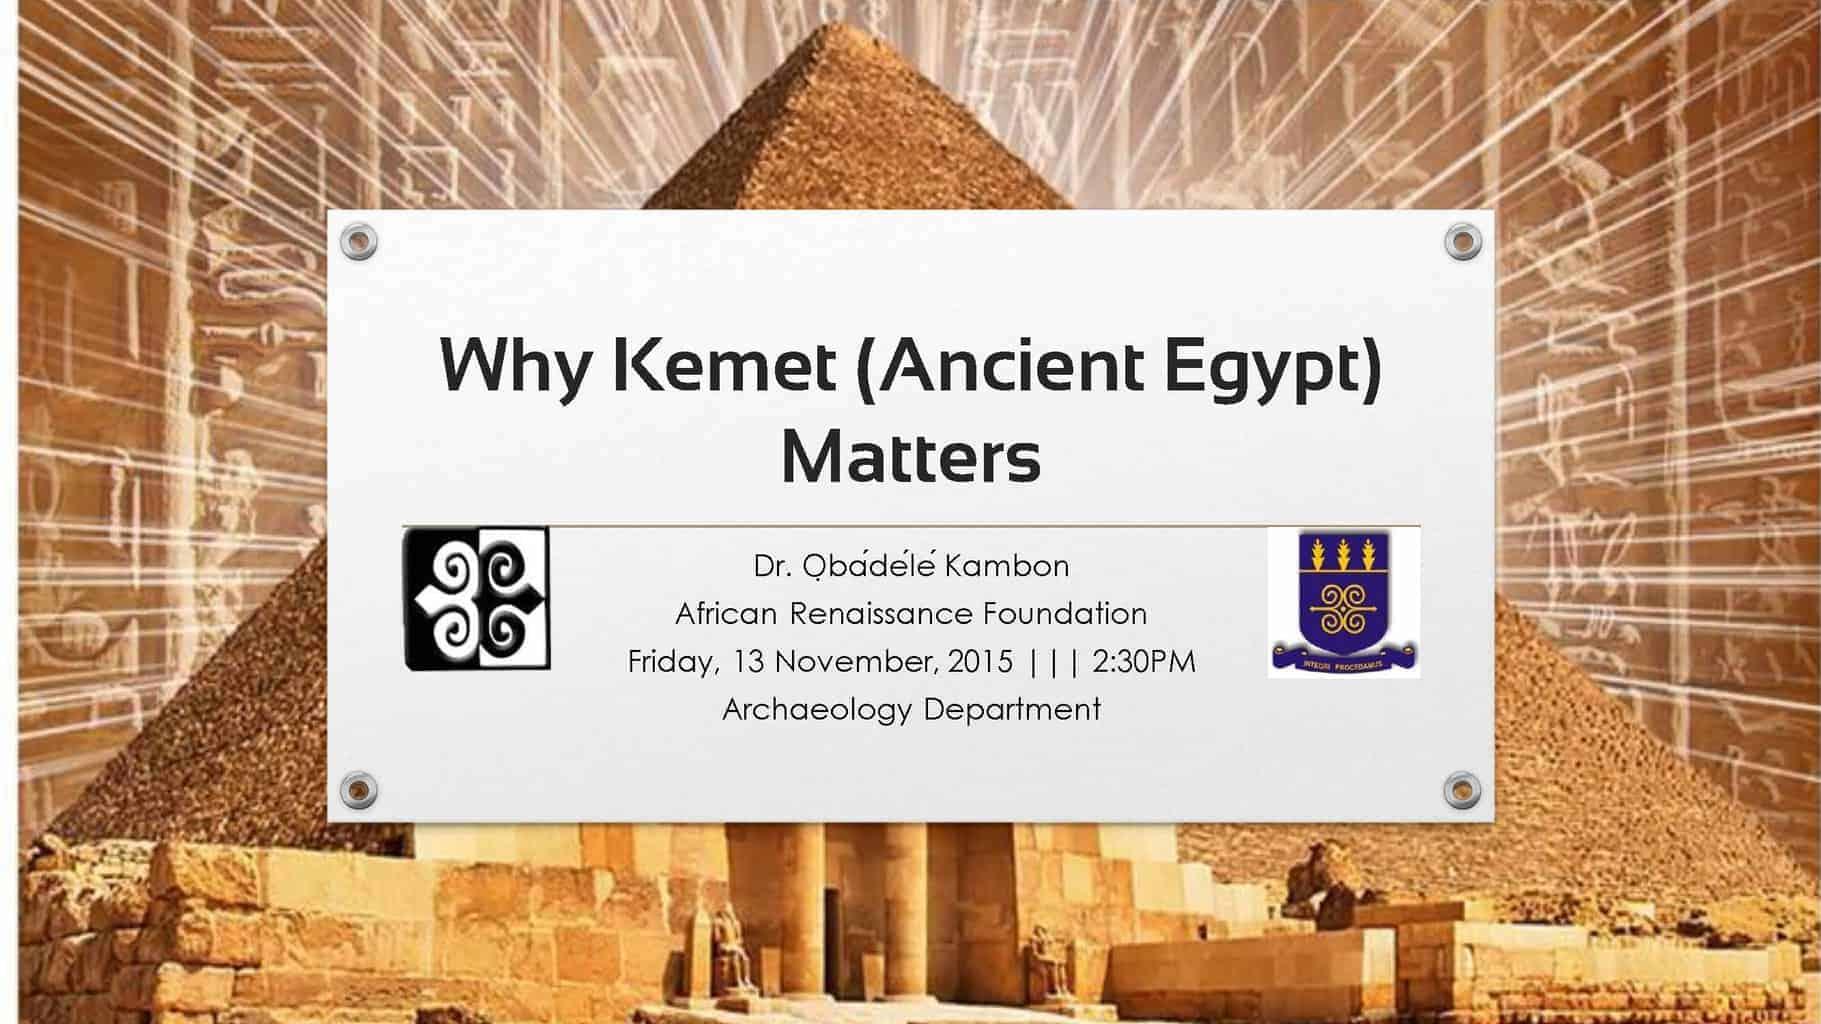 Why Kemet (Ancient Egypt) Matters [119 Slides!!!]